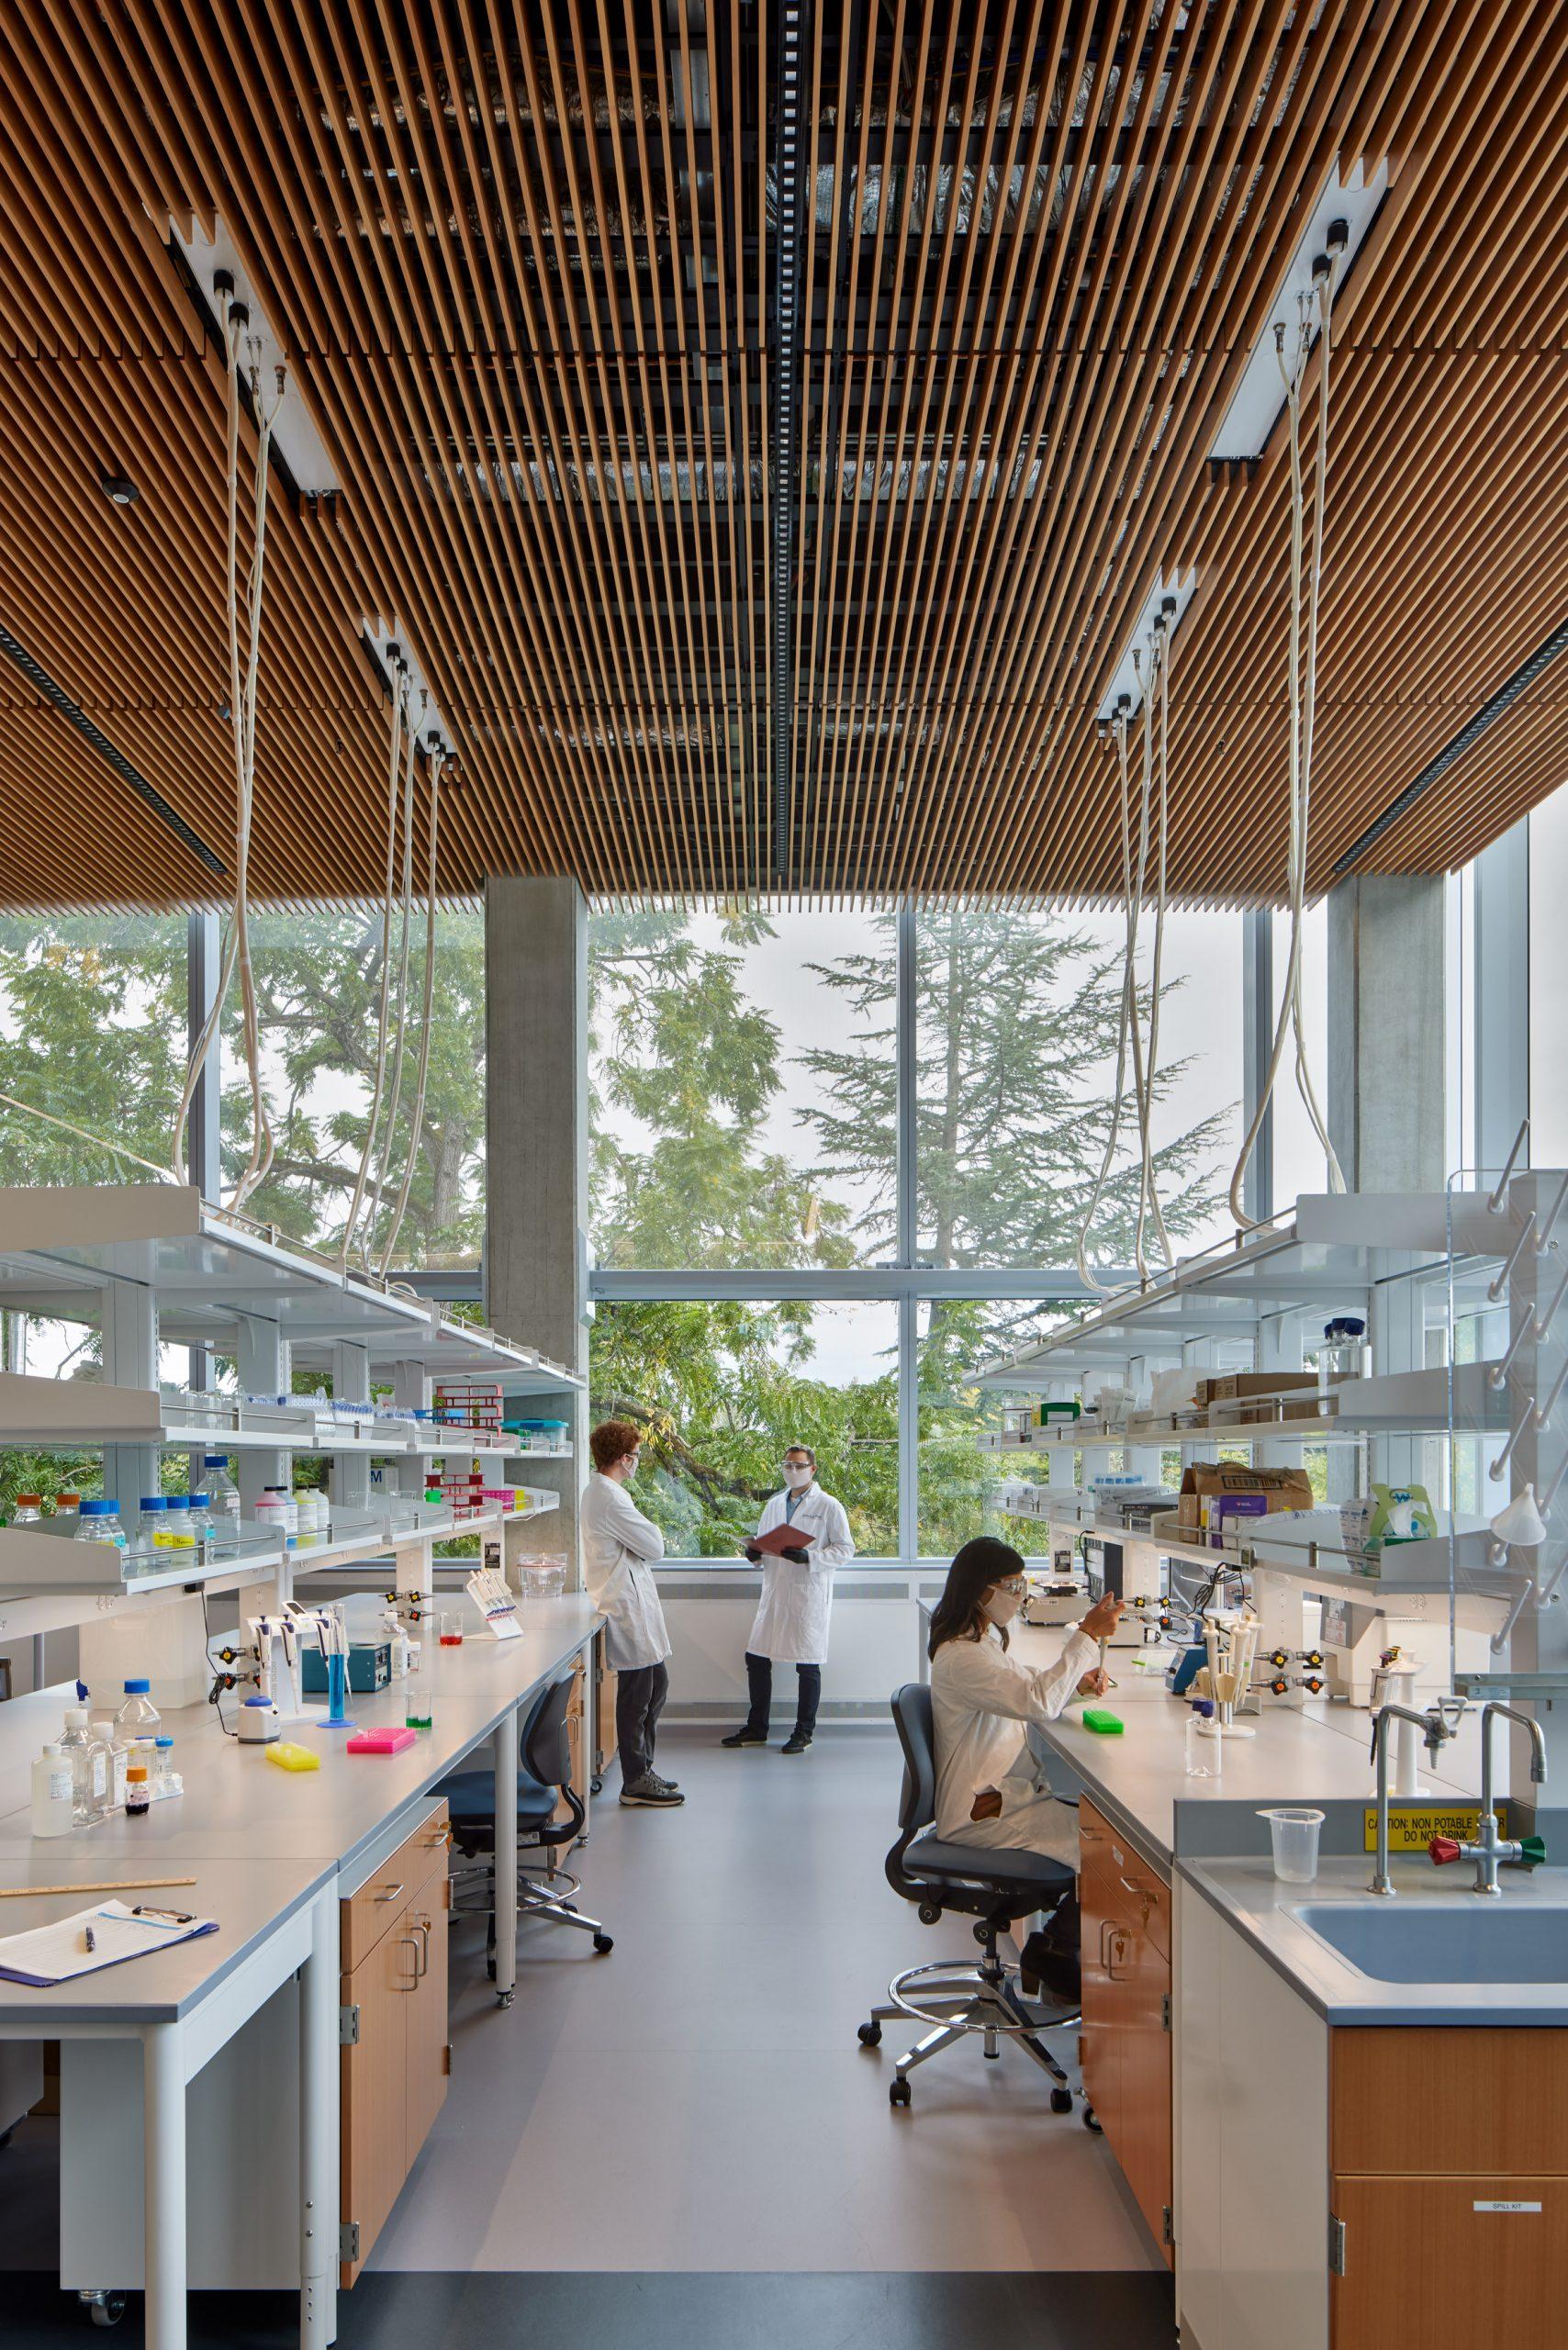 Laboratory of University of Oregon